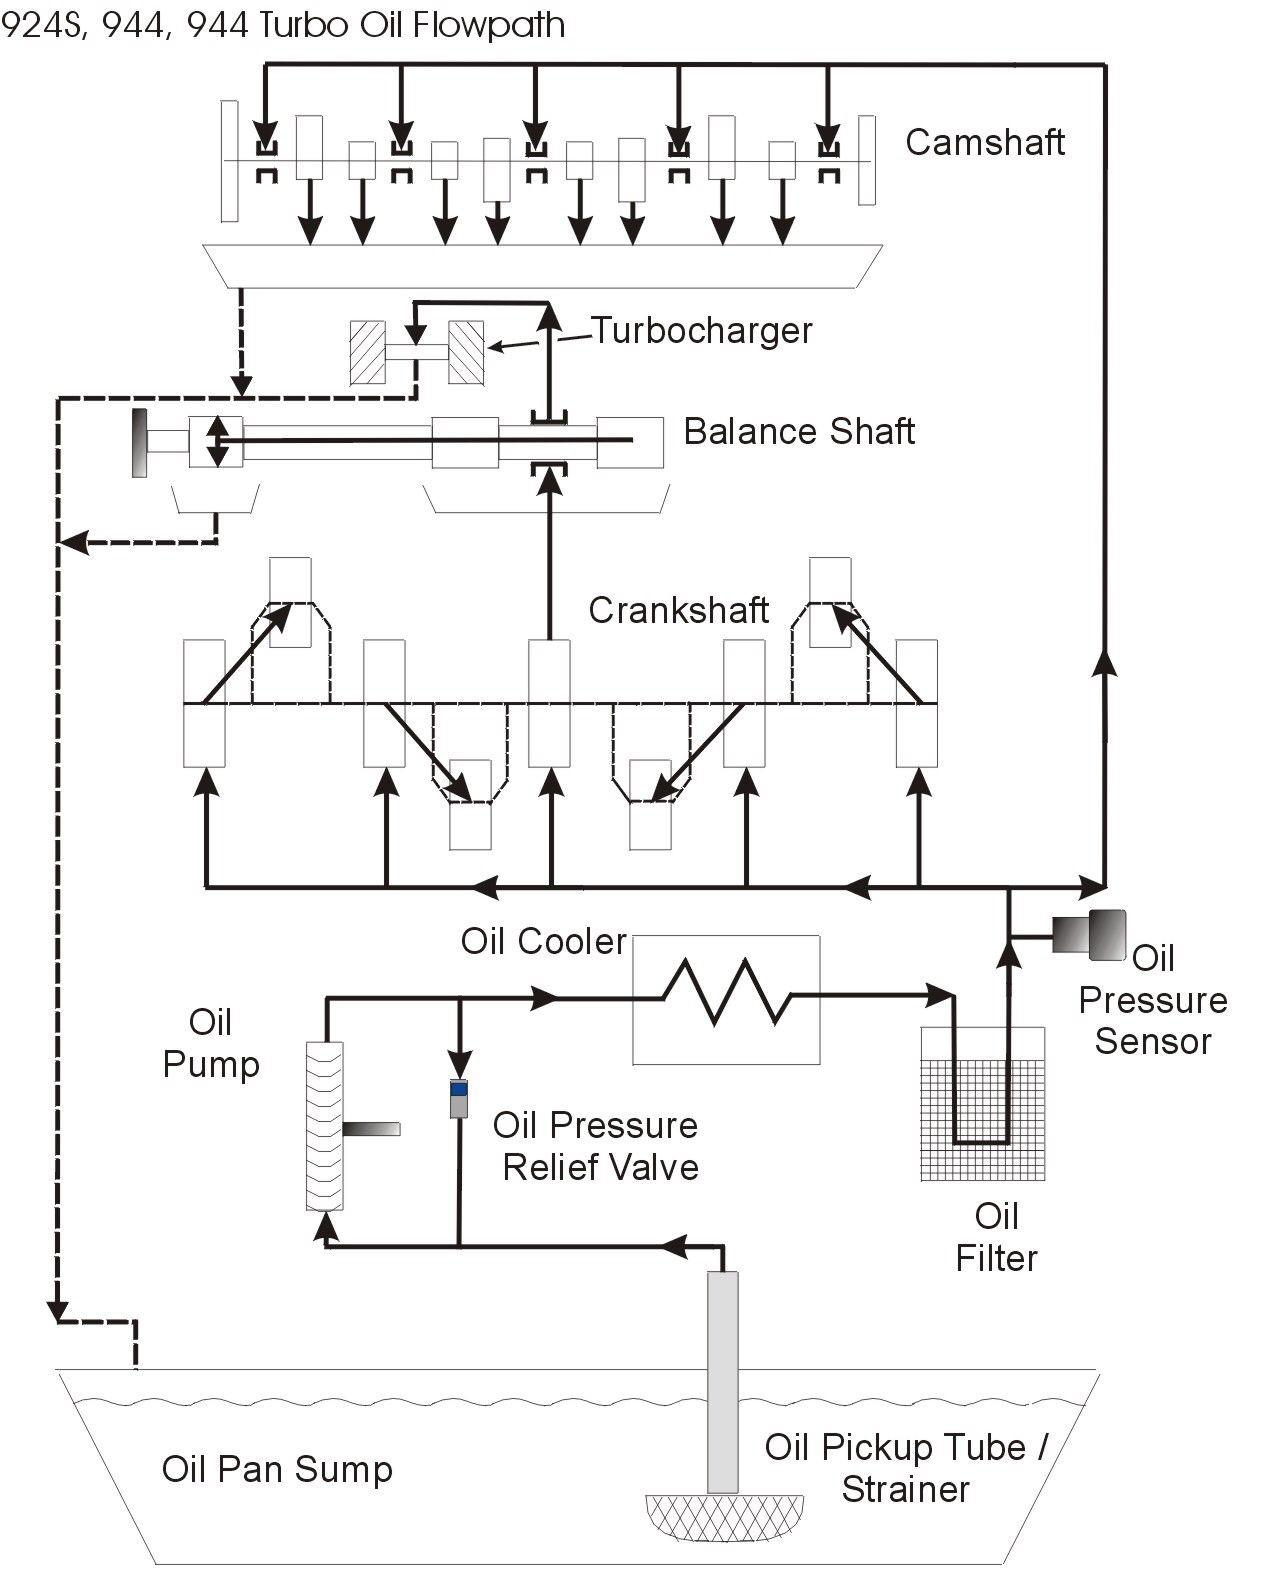 Engine Oiling Diagram Porsche 944 Engine Oil Flow Porsche Transaxles Pinterest Of Engine Oiling Diagram